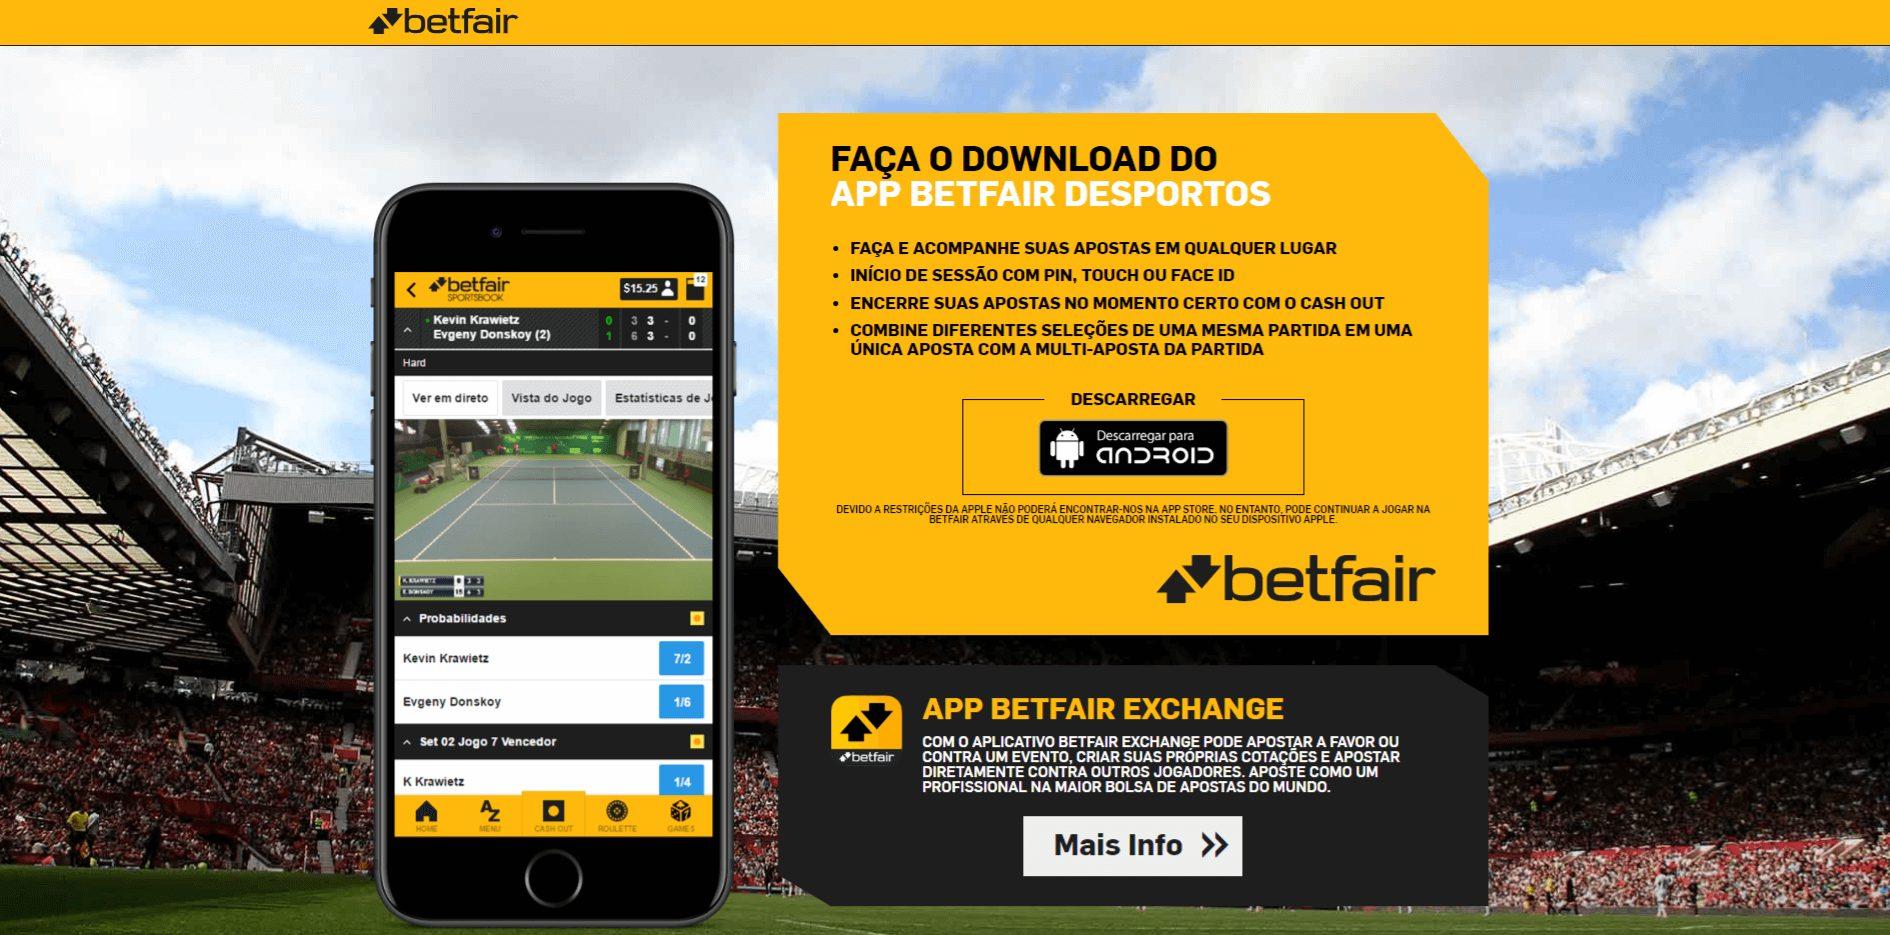 App Betfair desportos para Android